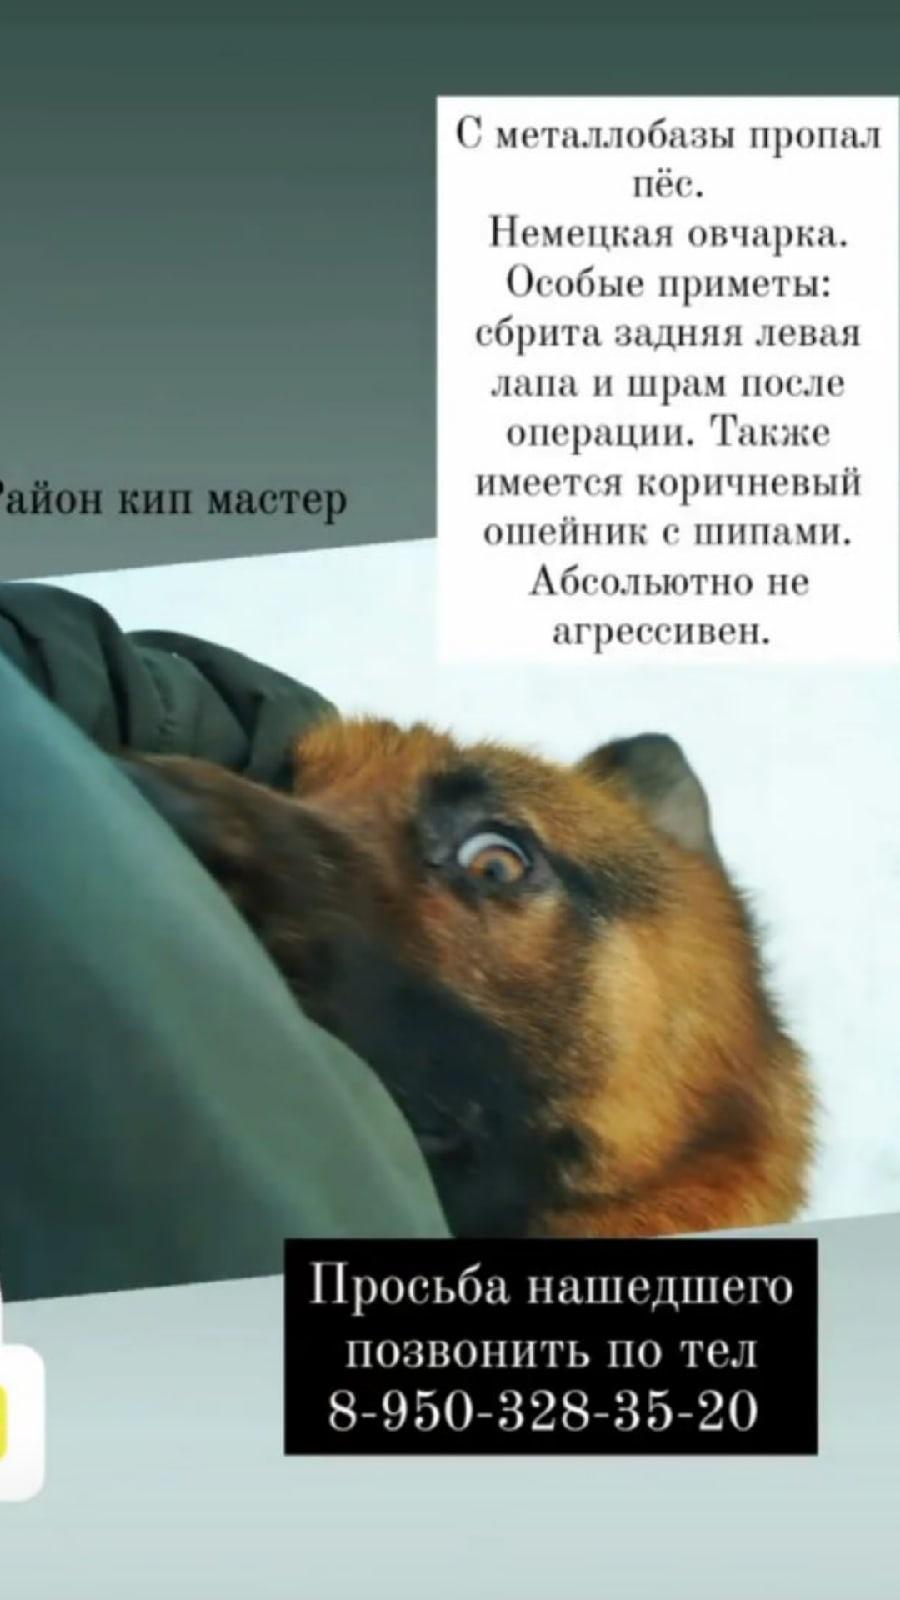 Пропала собака! Район кип мастер.  8-950-328-35-20